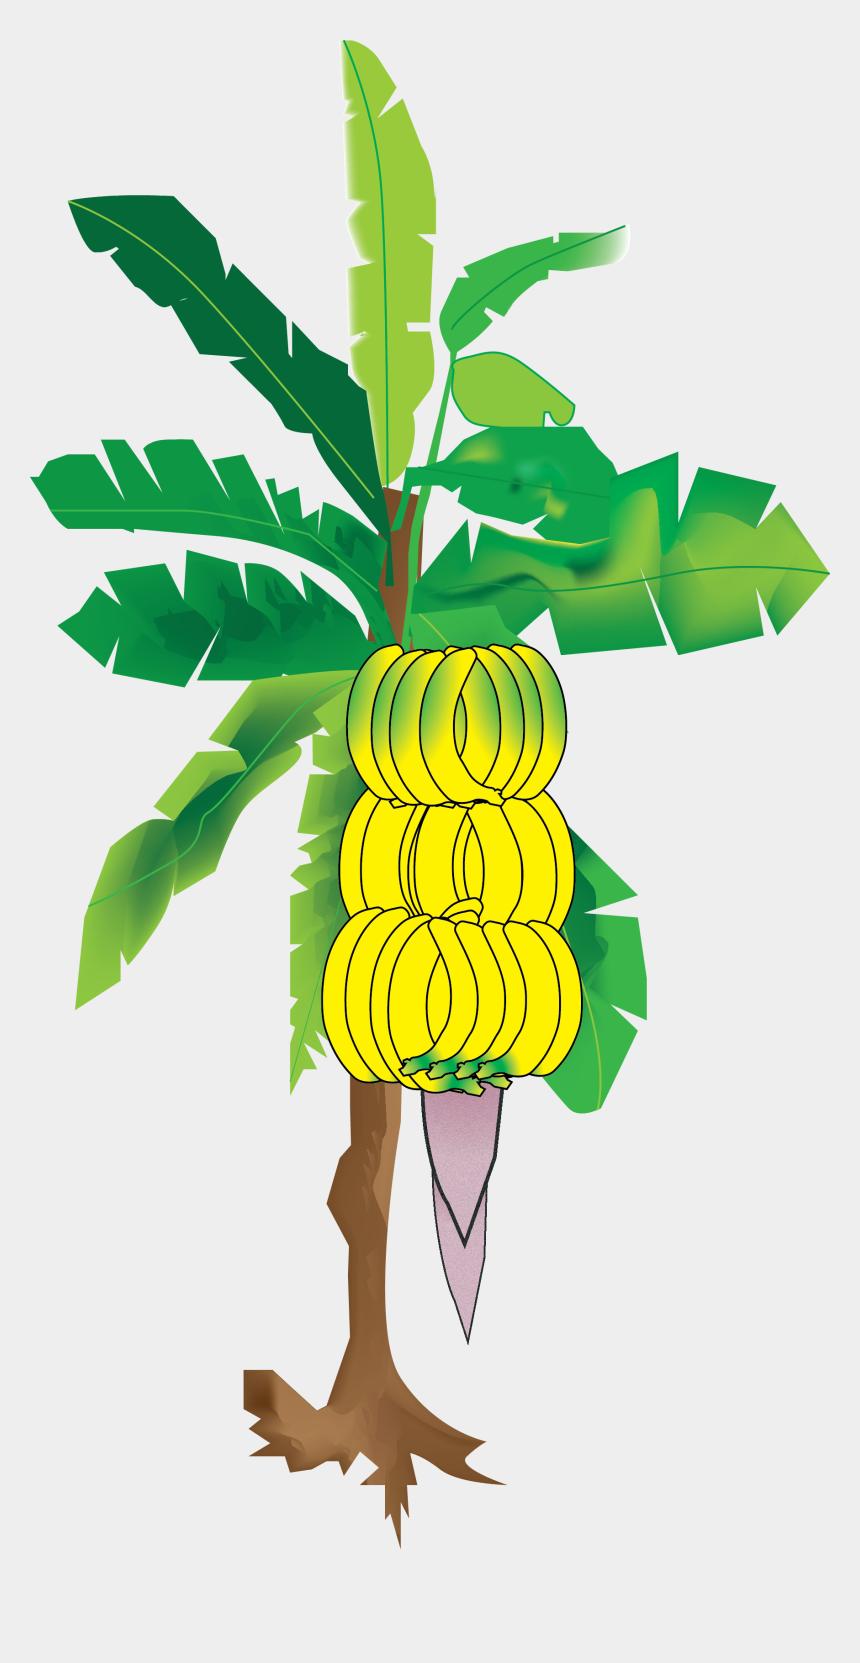 tropical climate clipart, Cartoons - My Illustration Of The Banana Tree From Sun's Eye An - Banana Tree Digital Painting